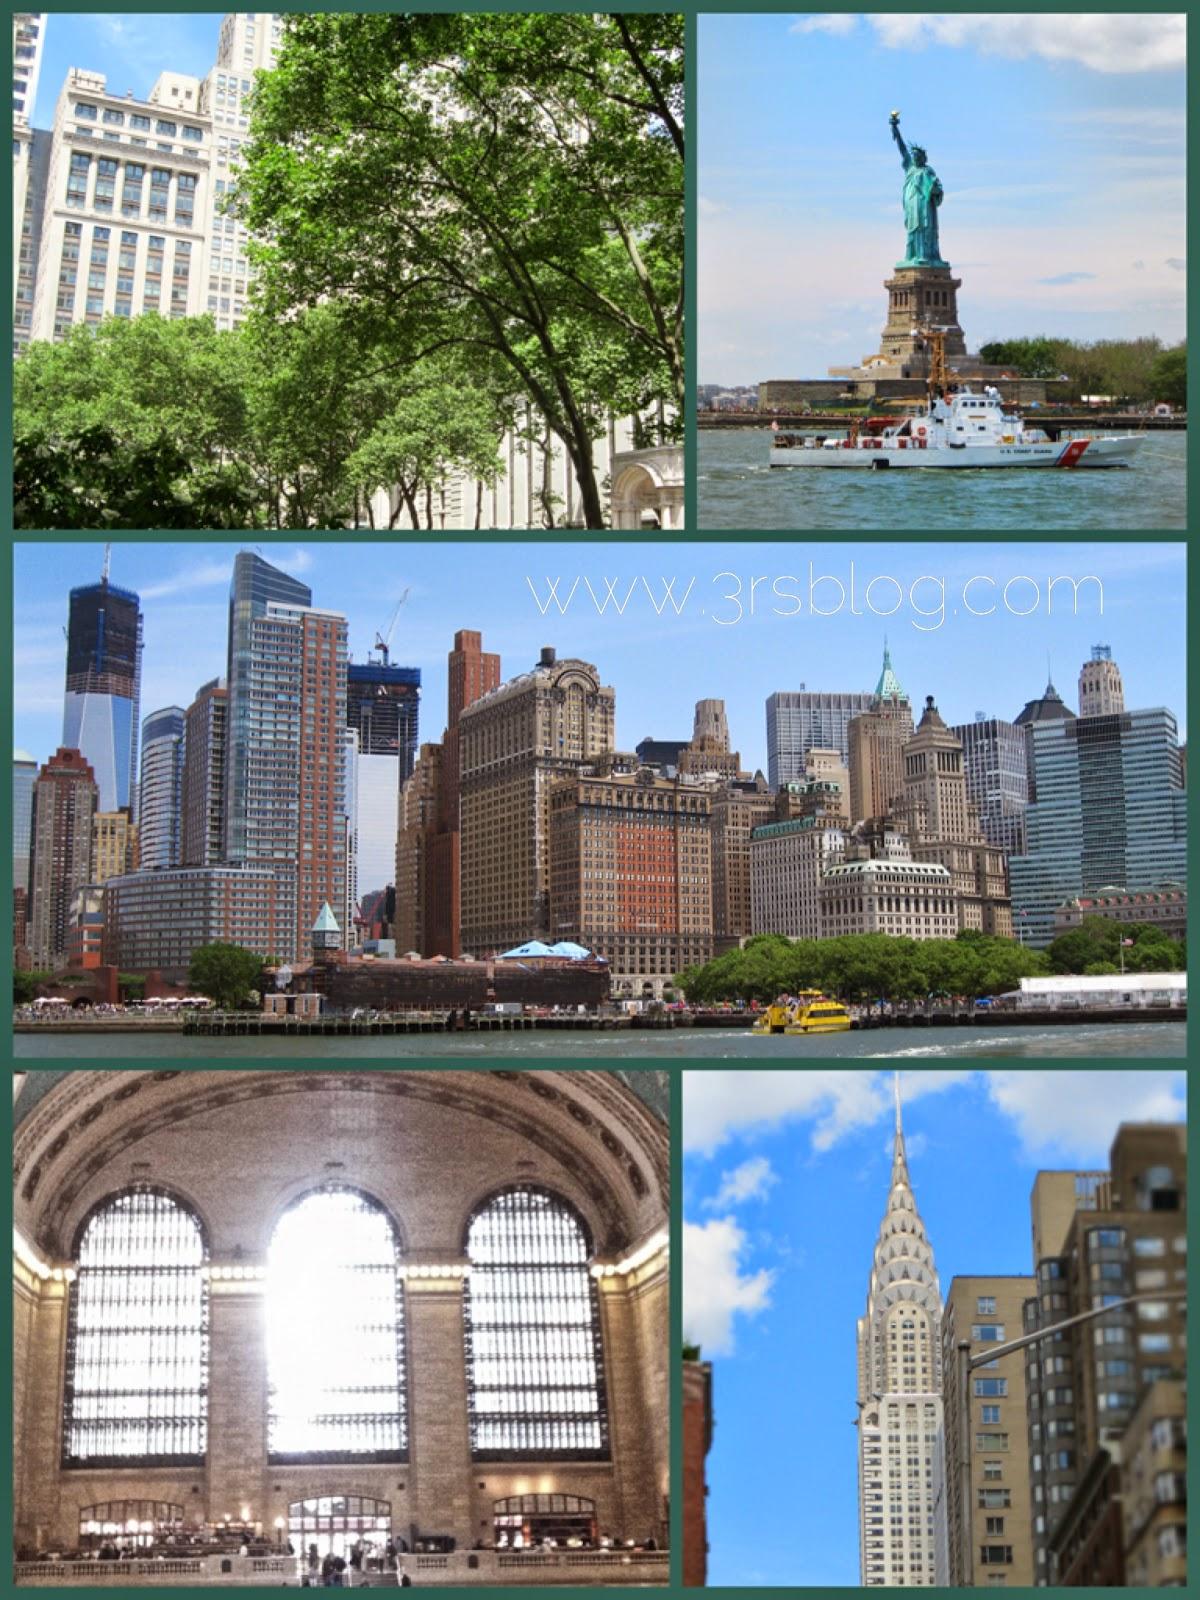 NYC Collage 3rsblog.com